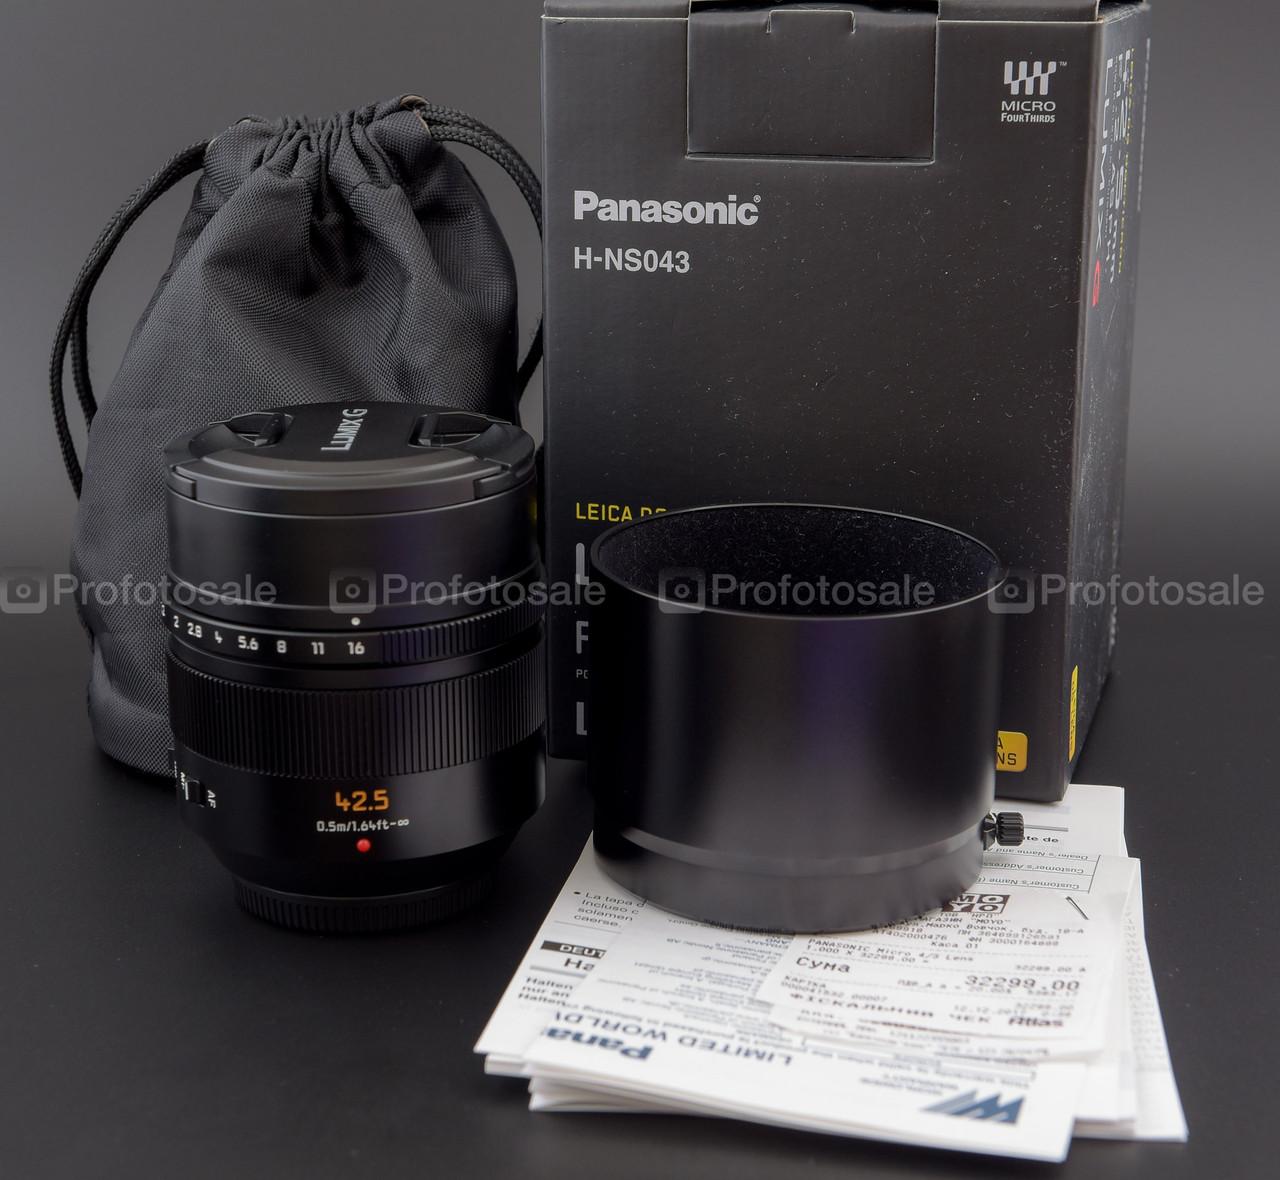 Panasonic Leica DG Nocticron 42.5 mm f/1.2 ASPH. POWER O.I.S. (H-NS043E)